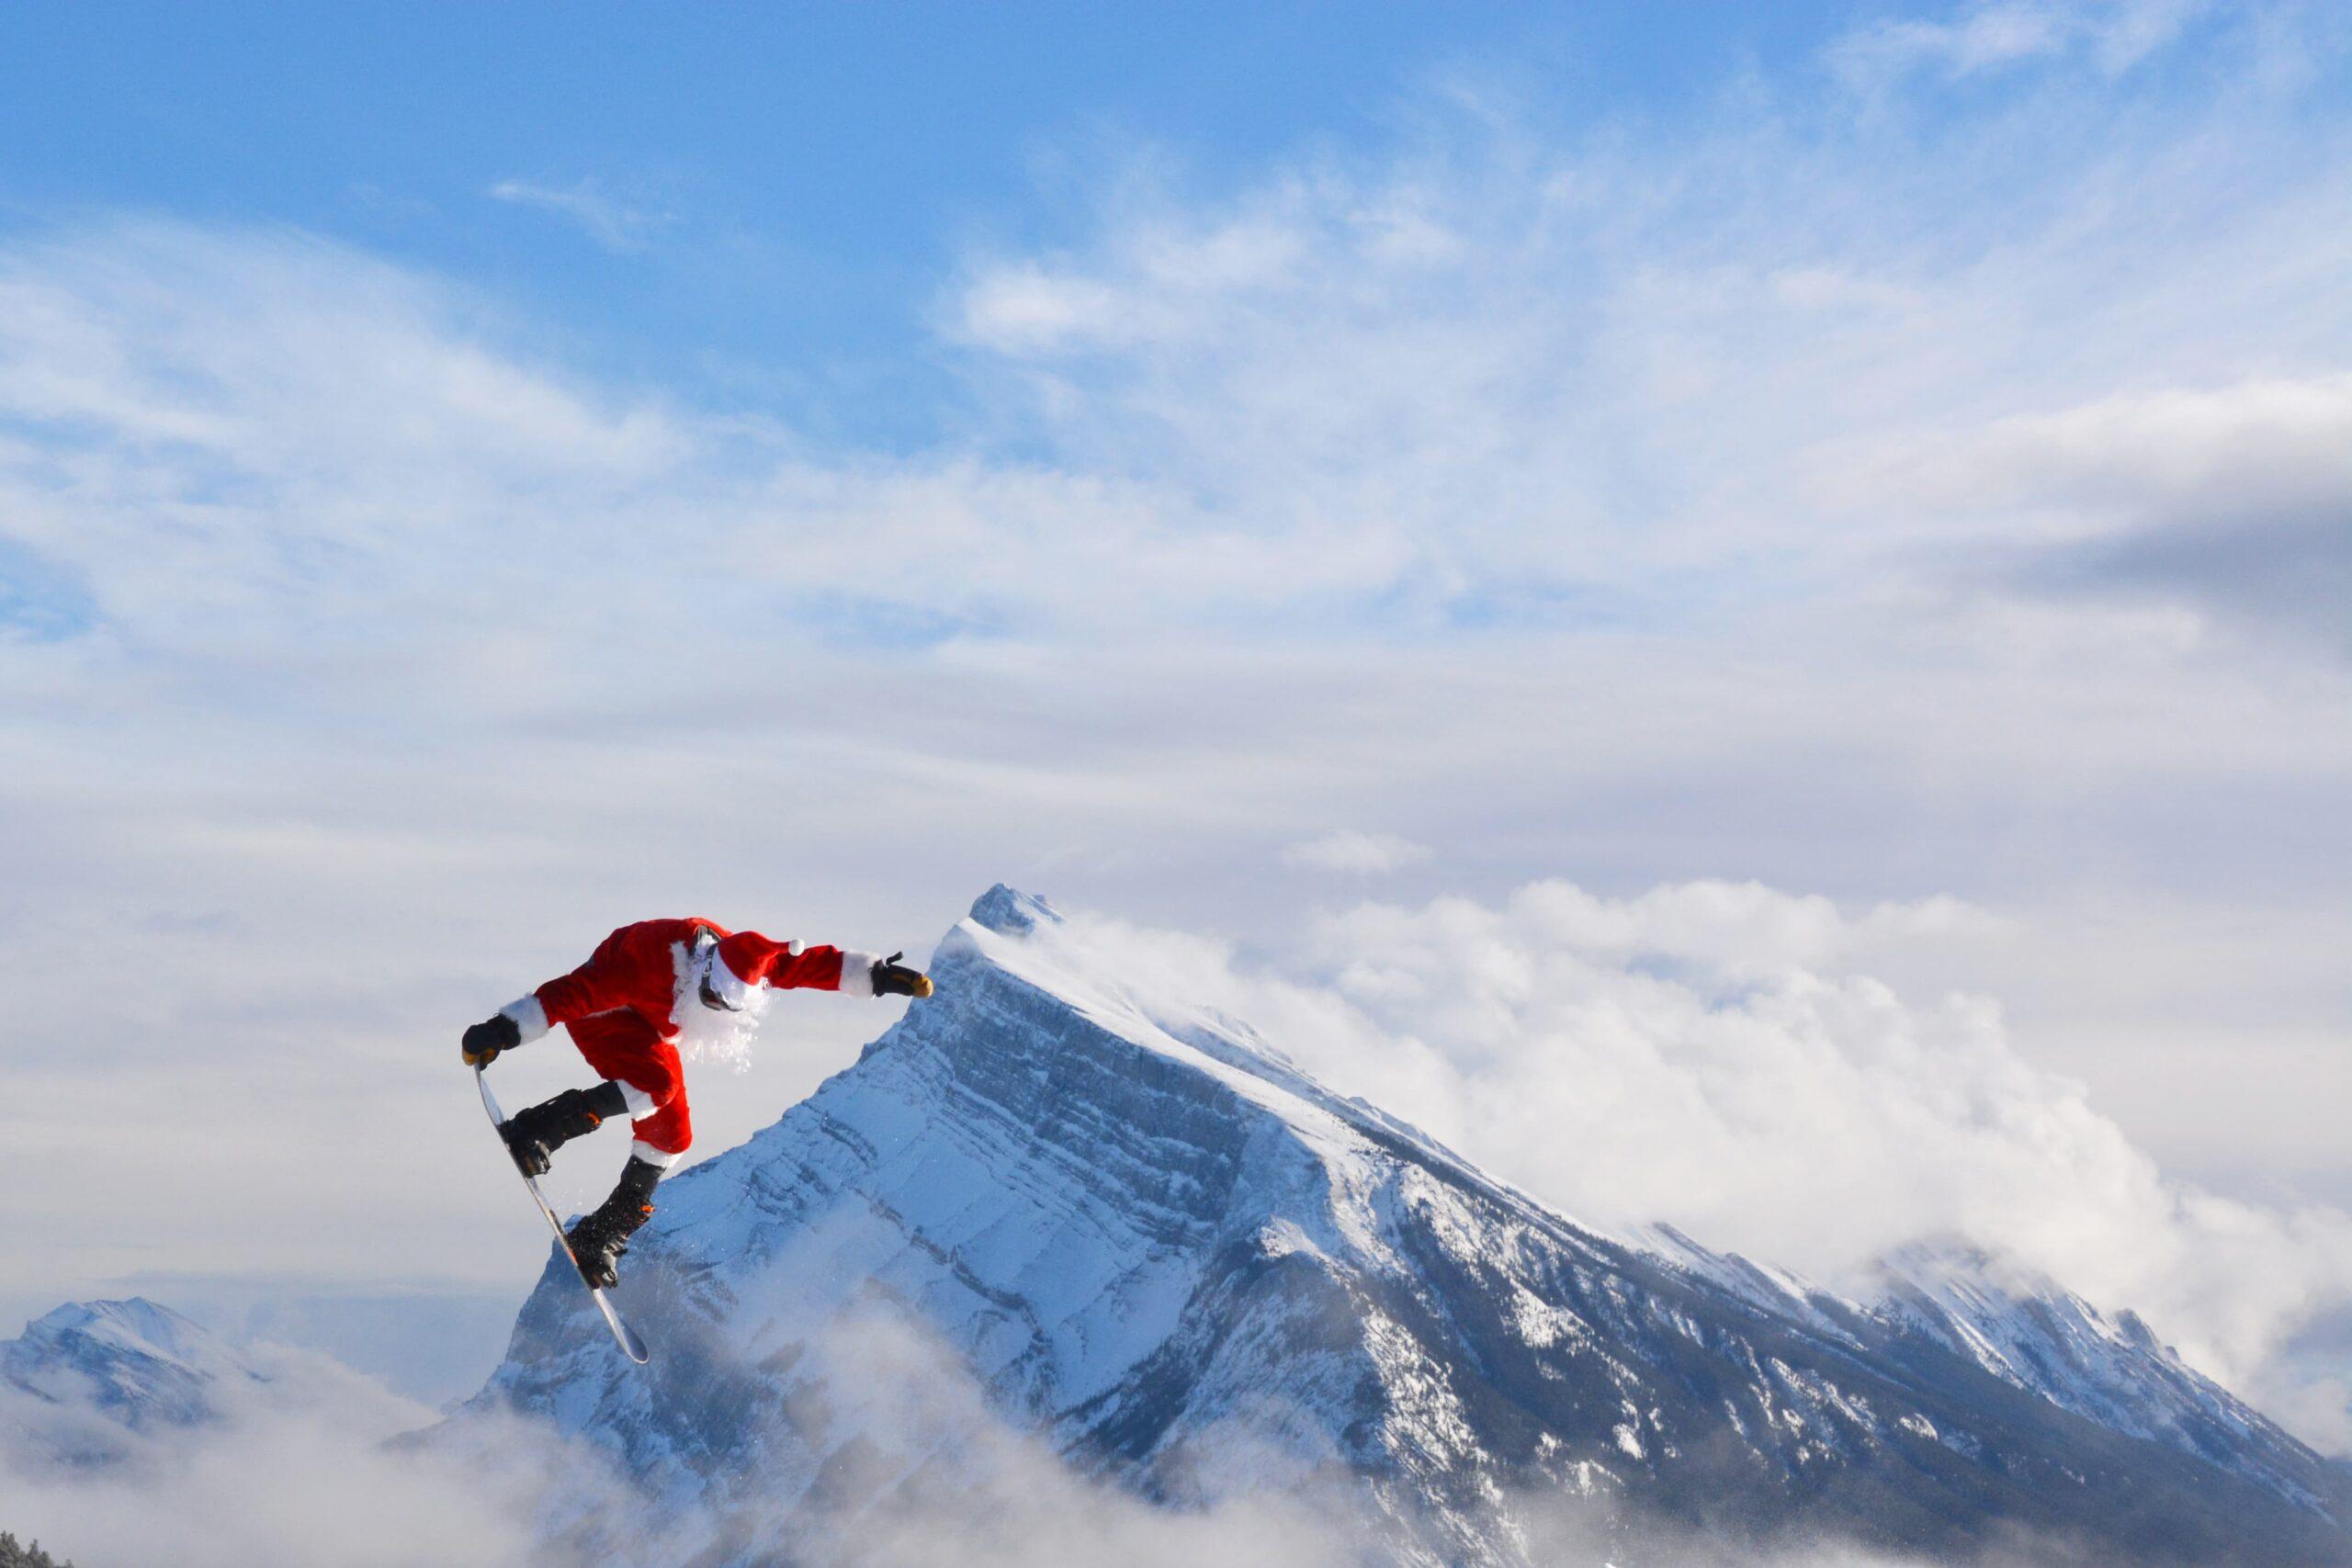 Santa Claus snowboarding